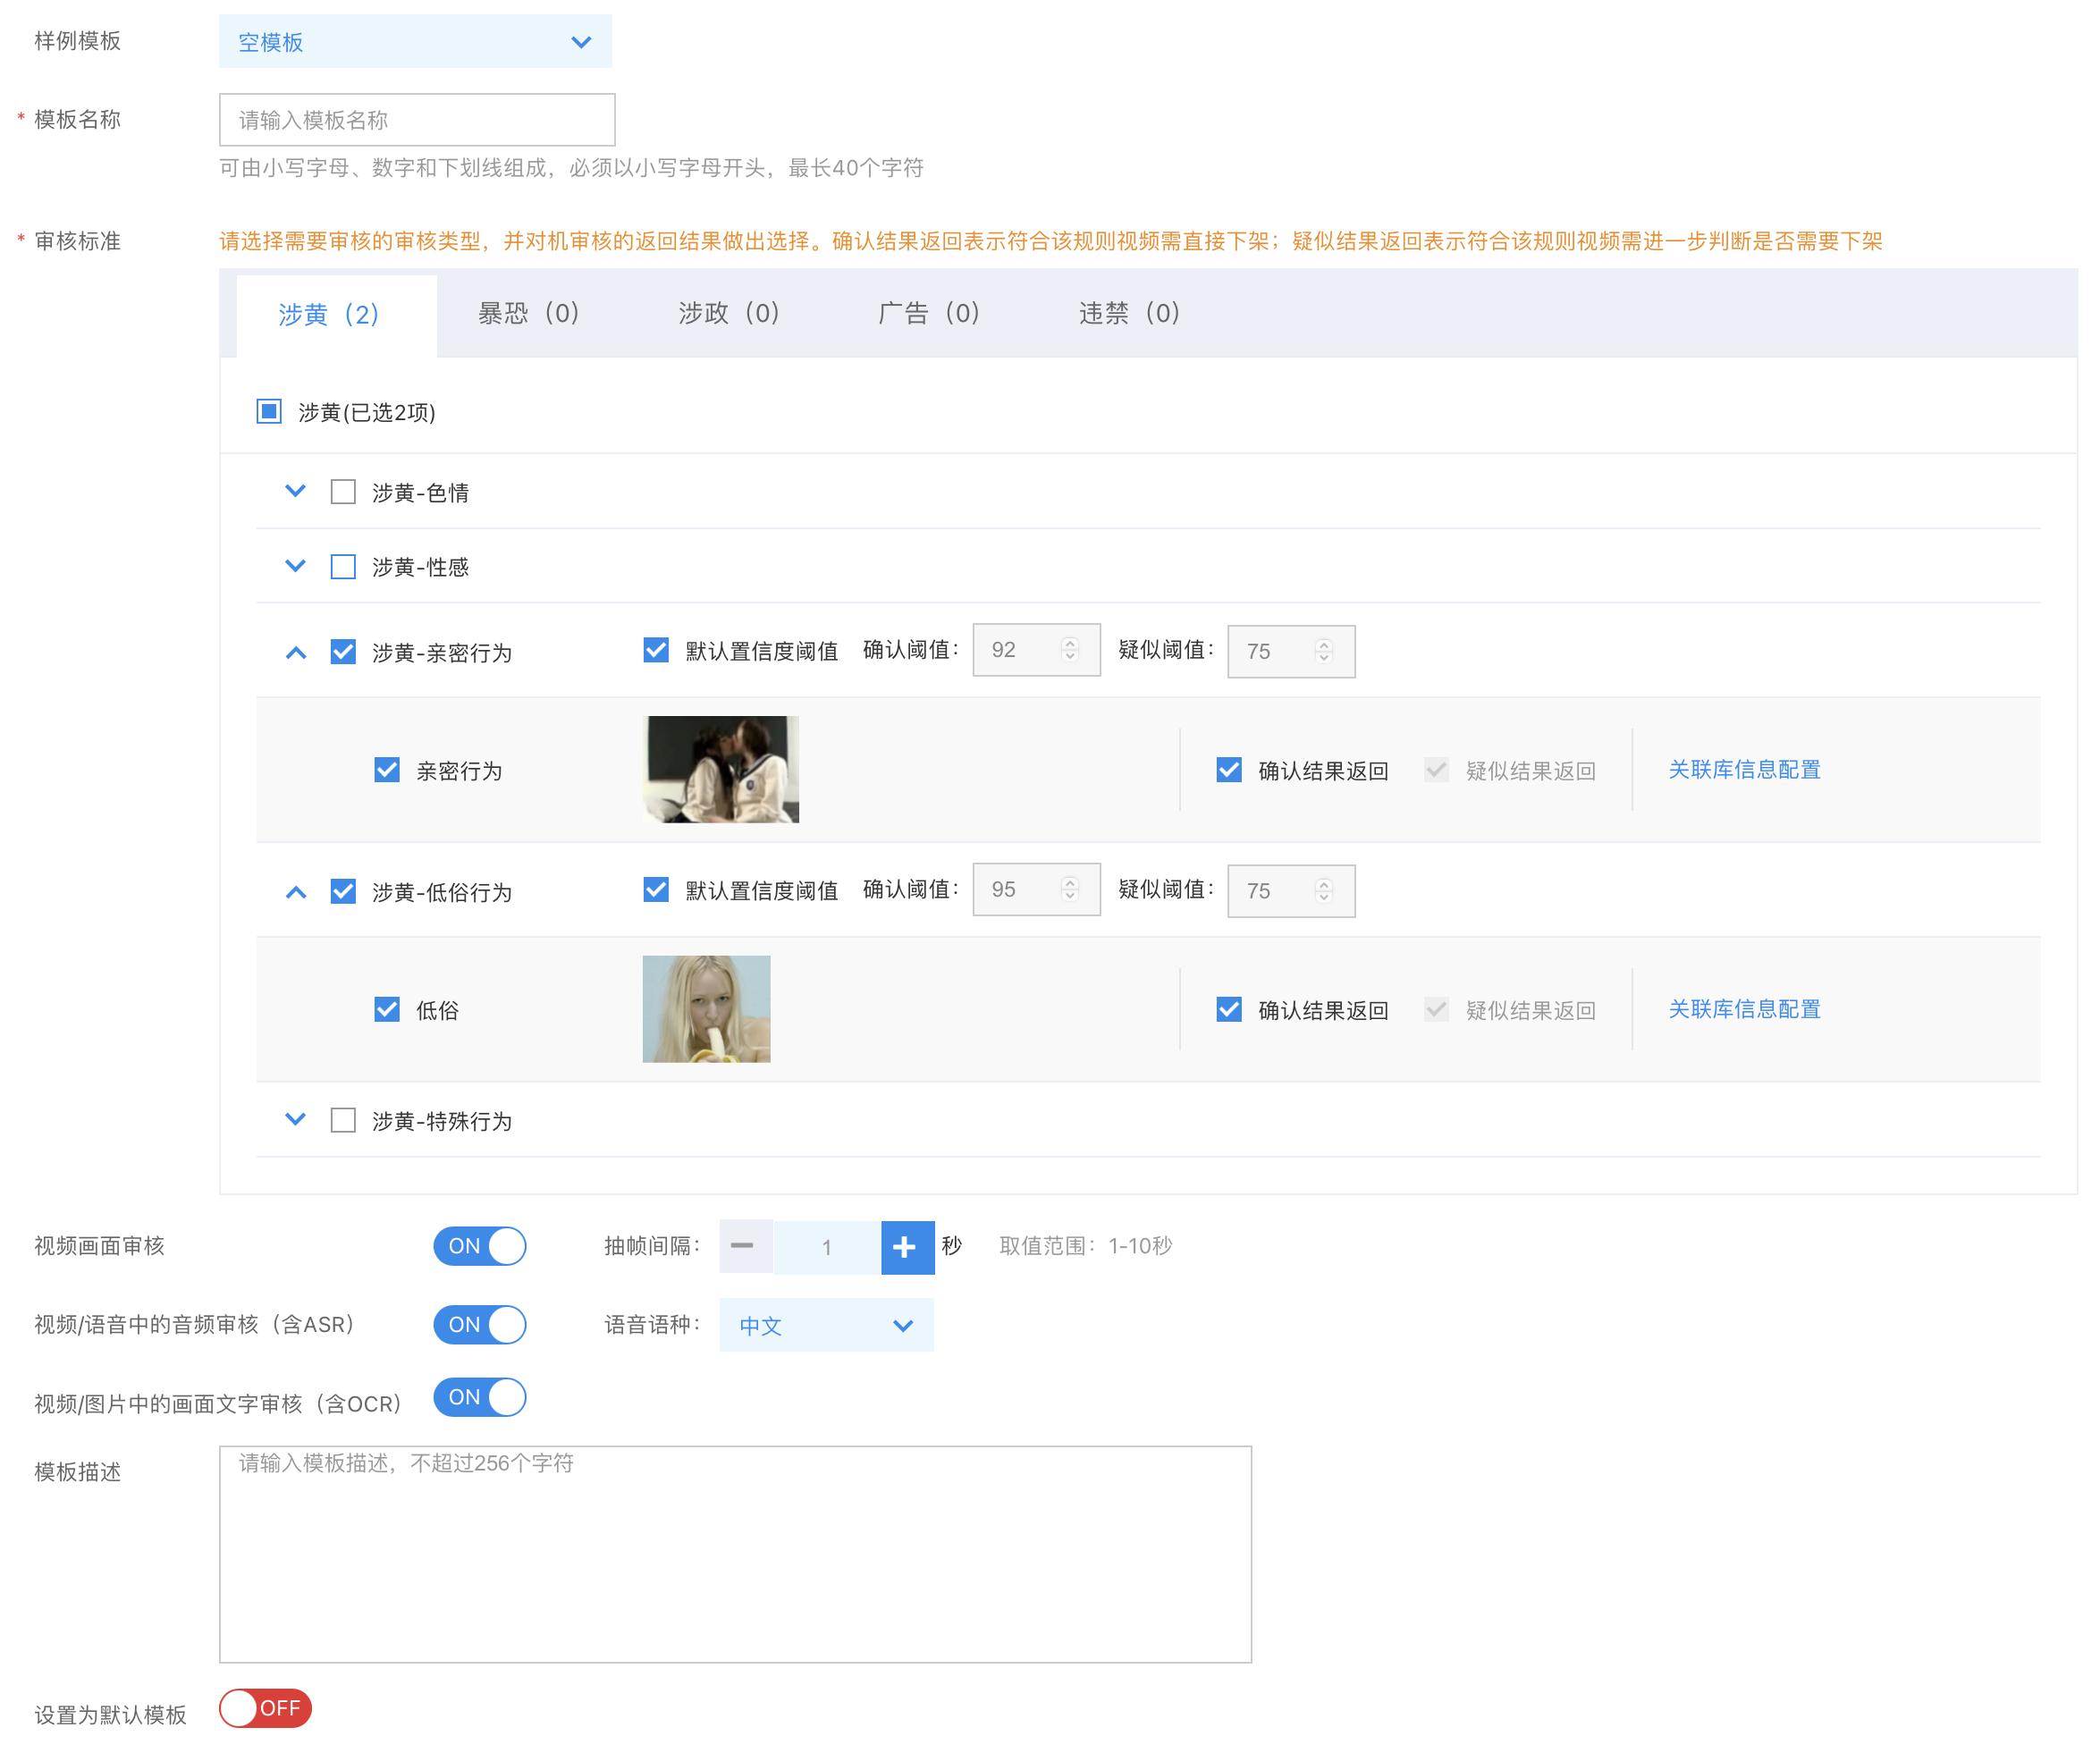 template_sample.png